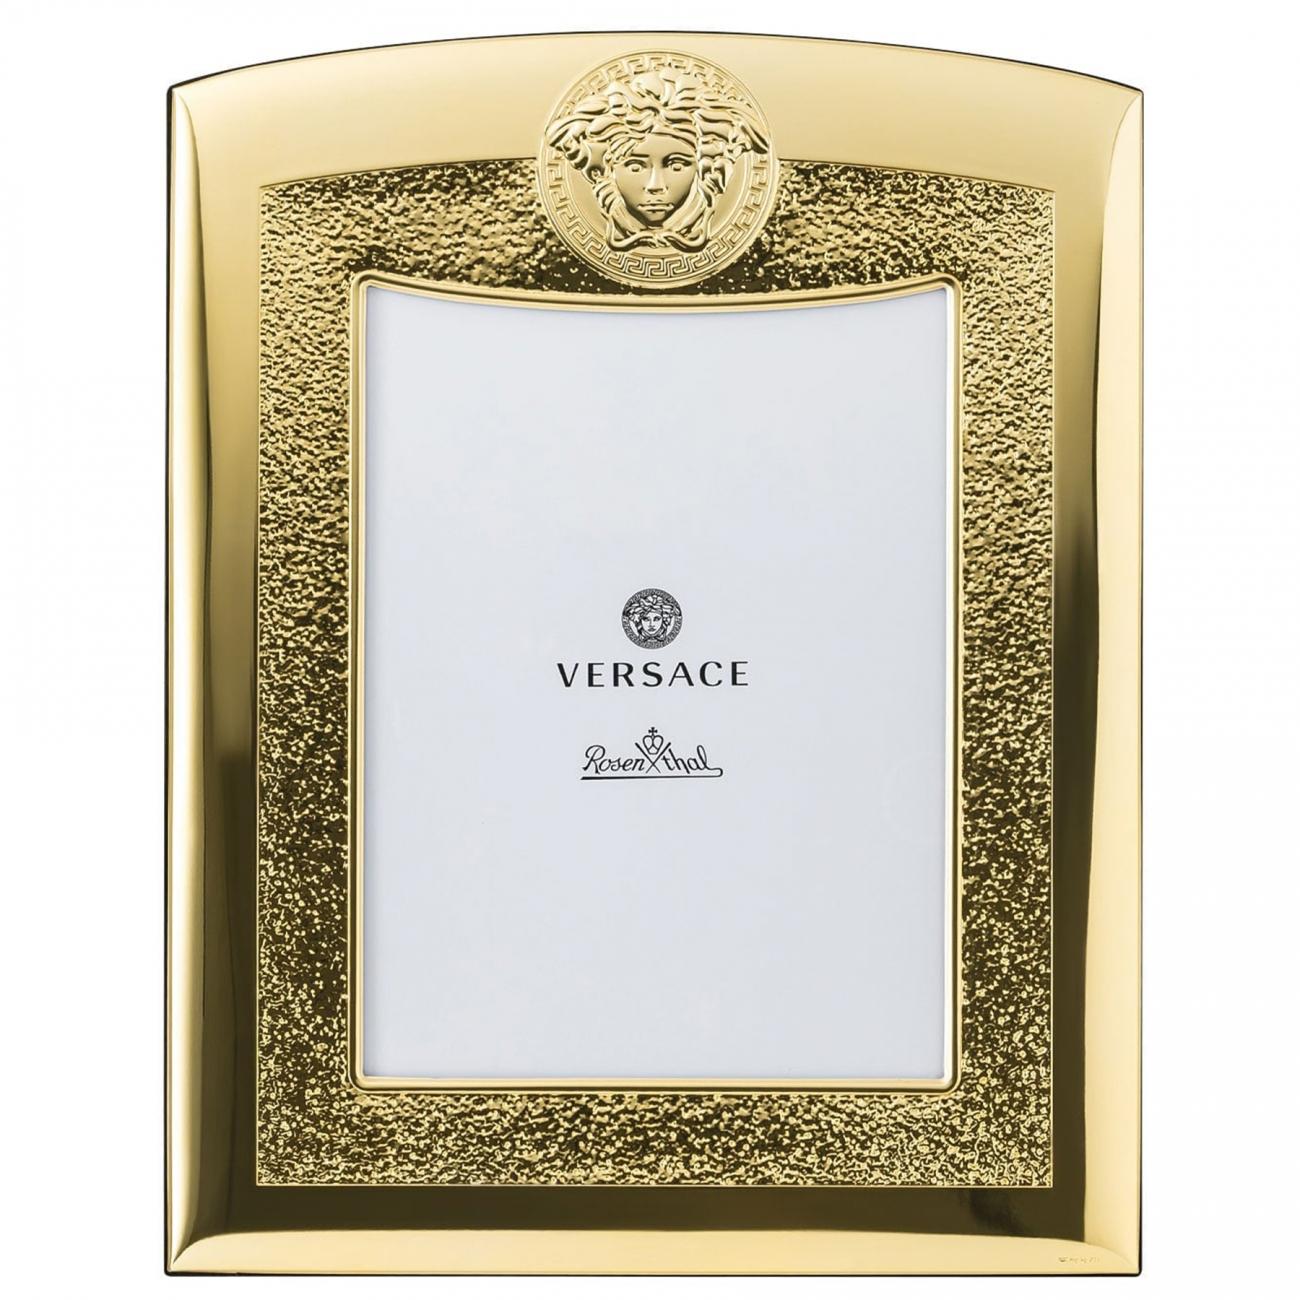 Rosenthal Versace Frames VHF7 Gold Portafotografie